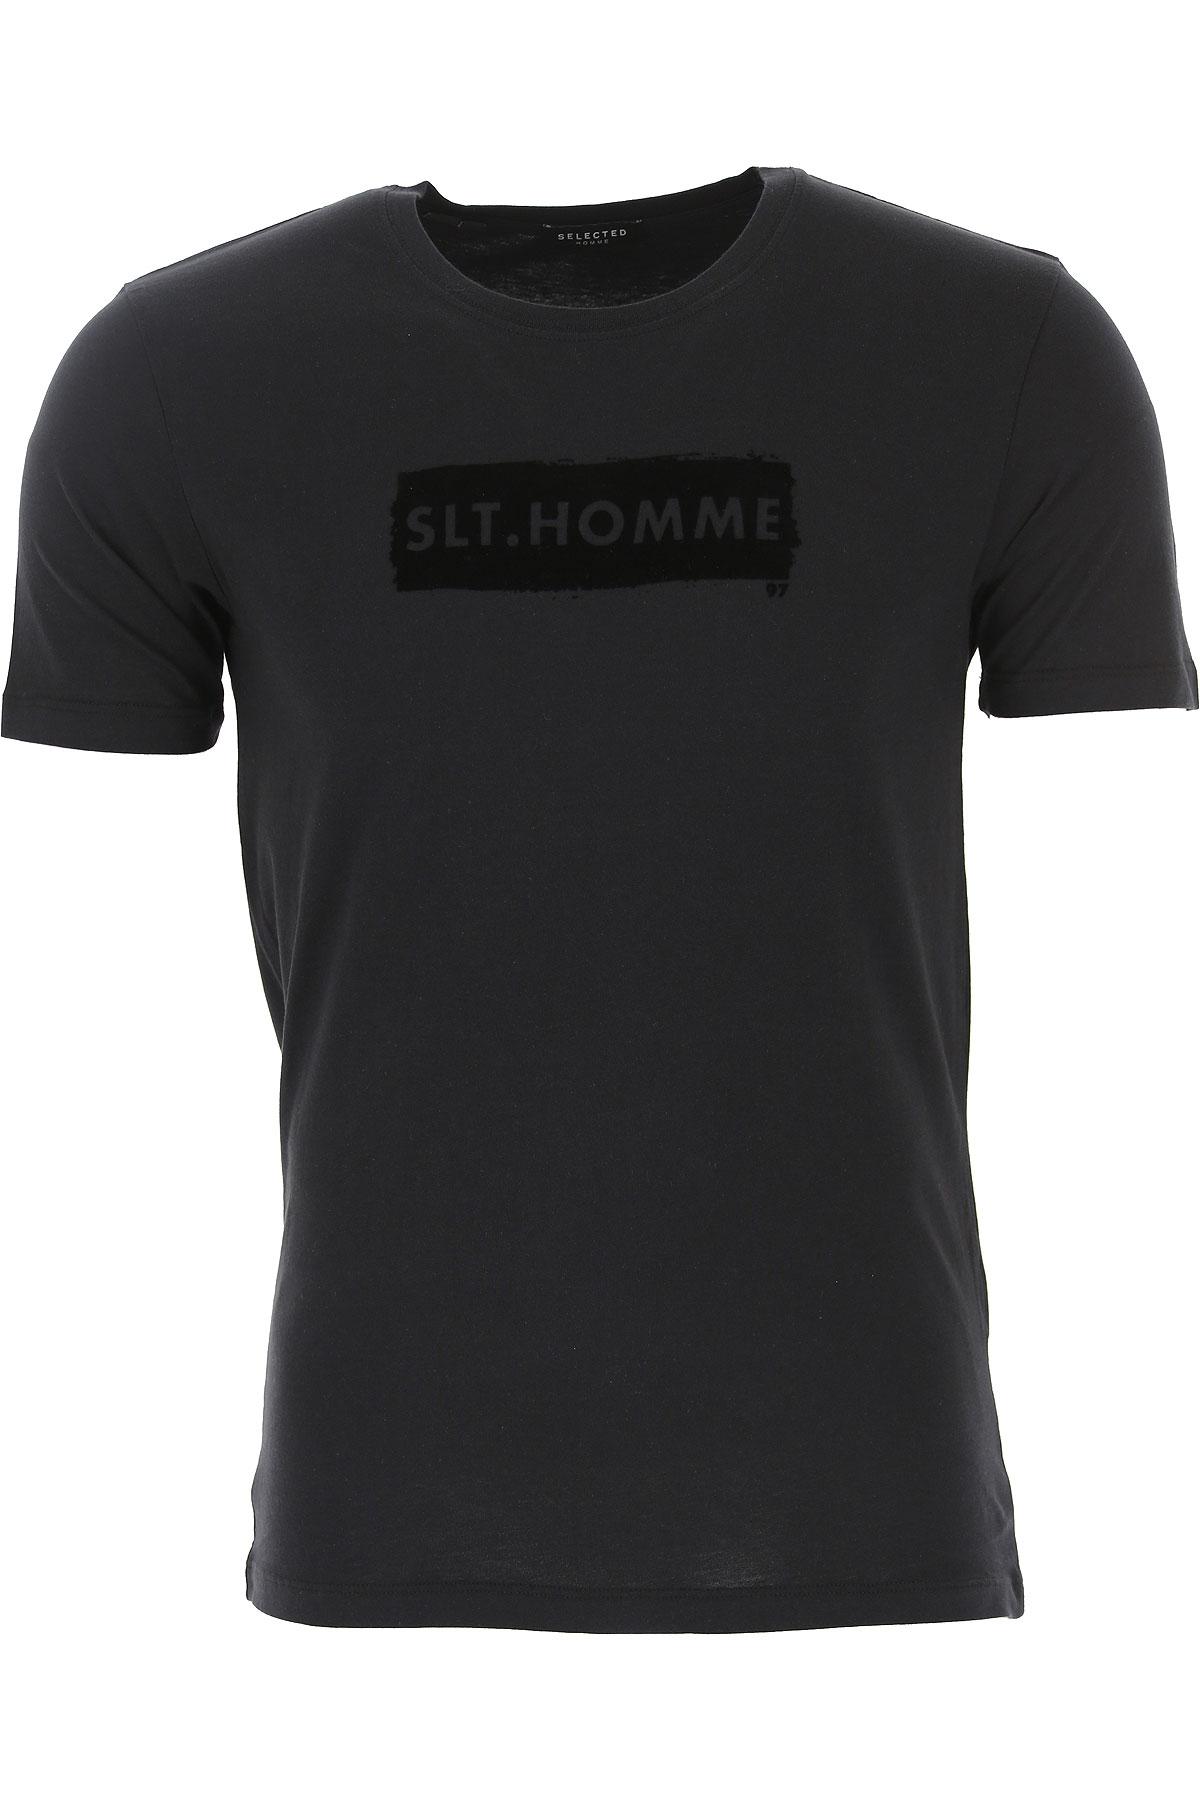 Selected T-Shirt for Men On Sale, Black, Cotton, 2019, L S